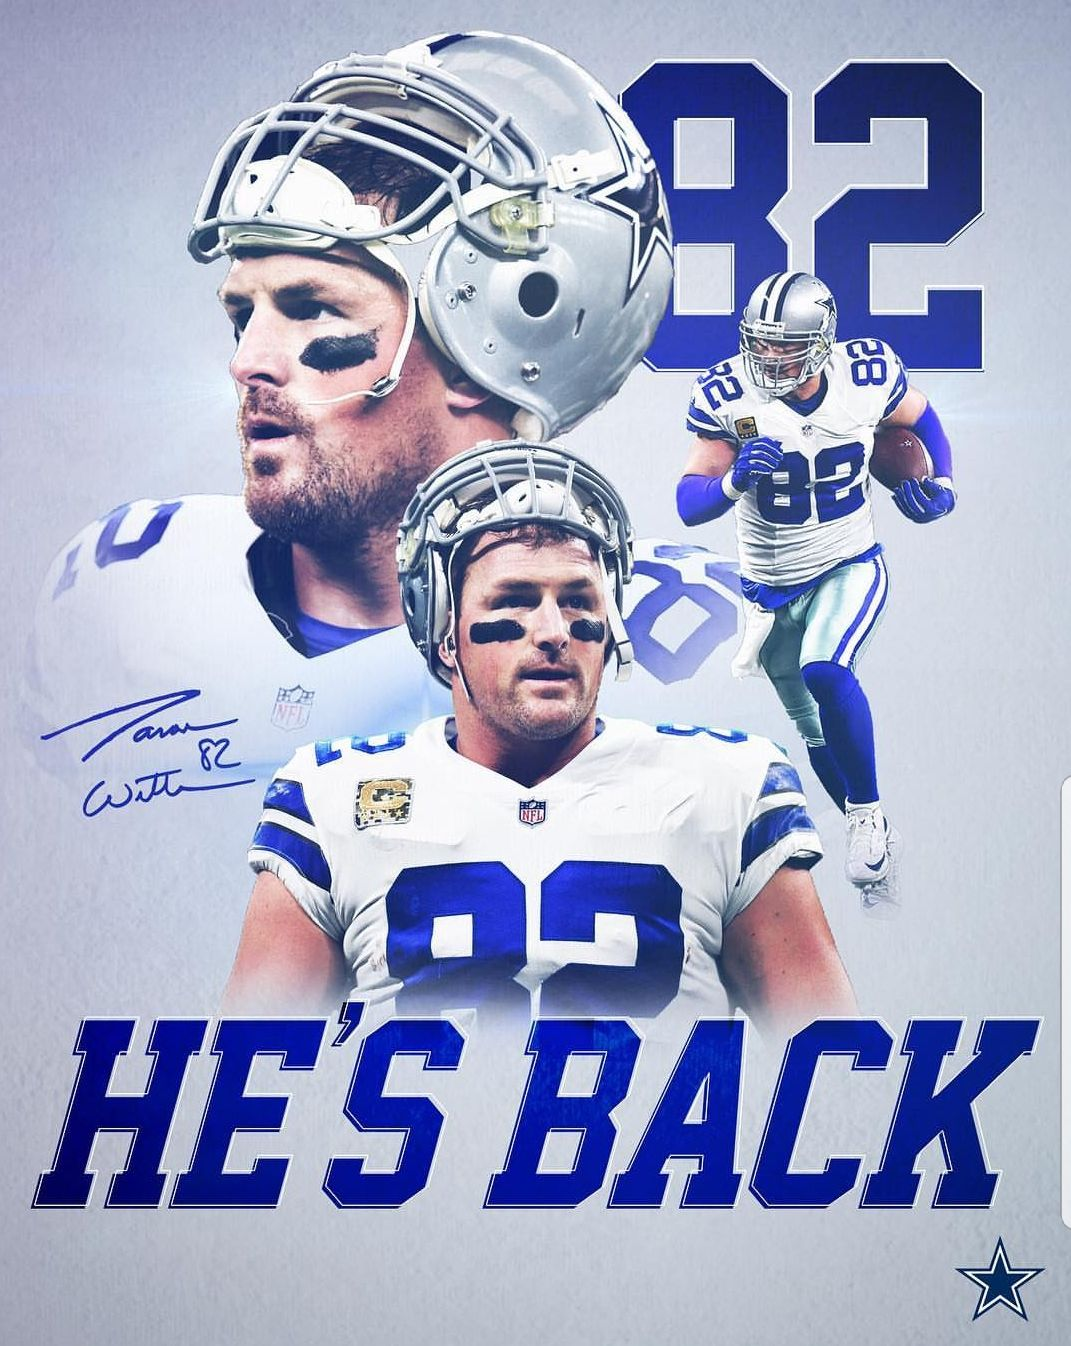 Yay! Love Jason Witten! Dallas cowboys football team